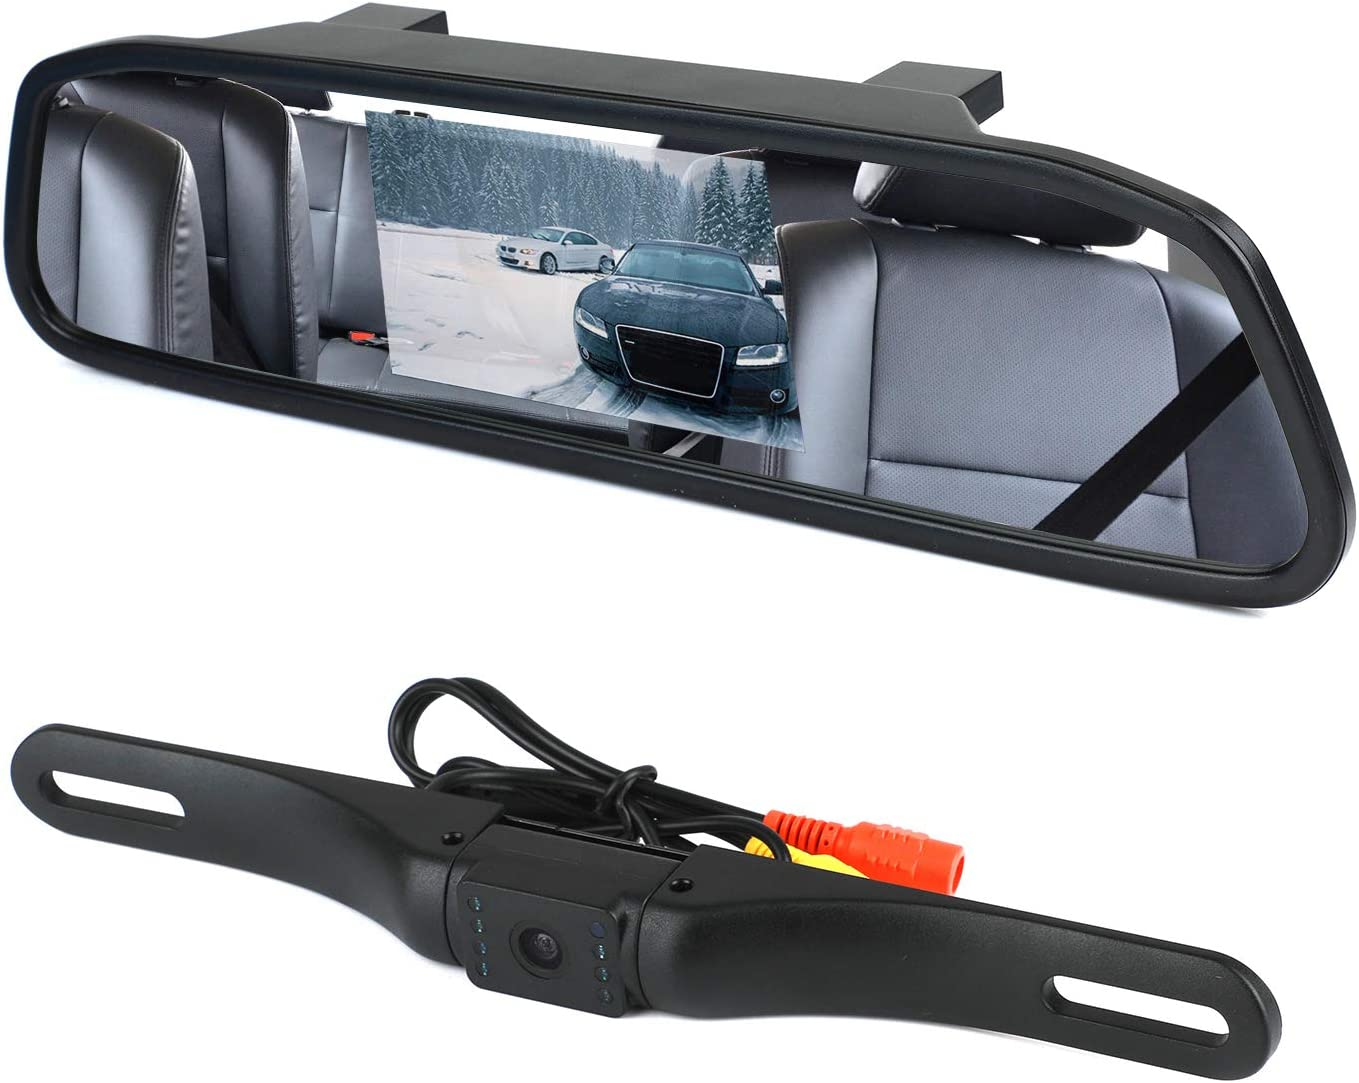 "WEIKAILTD Backup Camera and Monitor Kit, 4.3"" Car Vehicle Rearview Mirror Monitor for DVD/VCR/Car Reverse Camera Waterproof Car License Plate Rear View Camera (4.3"" Backup Camera and Monitor Kit)"